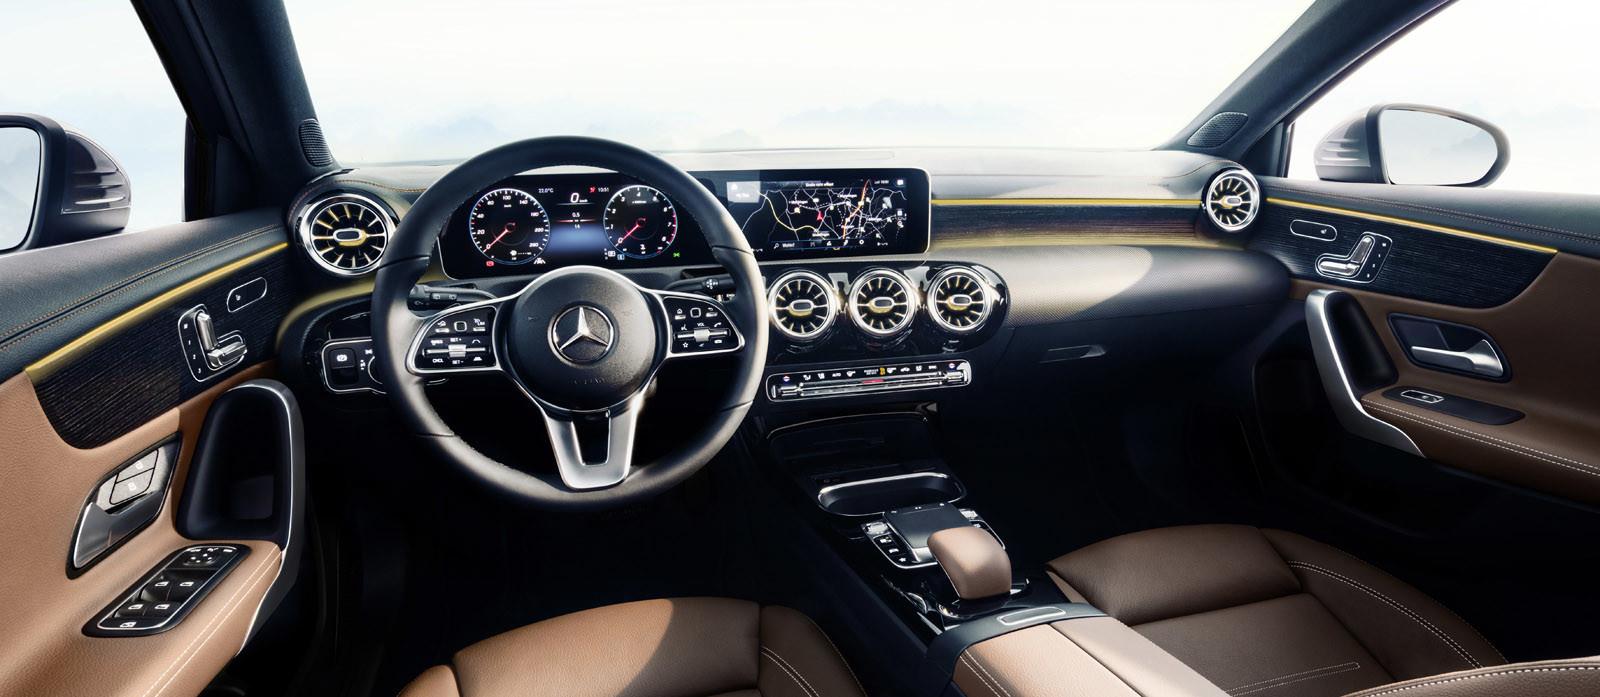 Foto de Mercedes-Benz Clase A 2018: impresiones del interior (7/28)